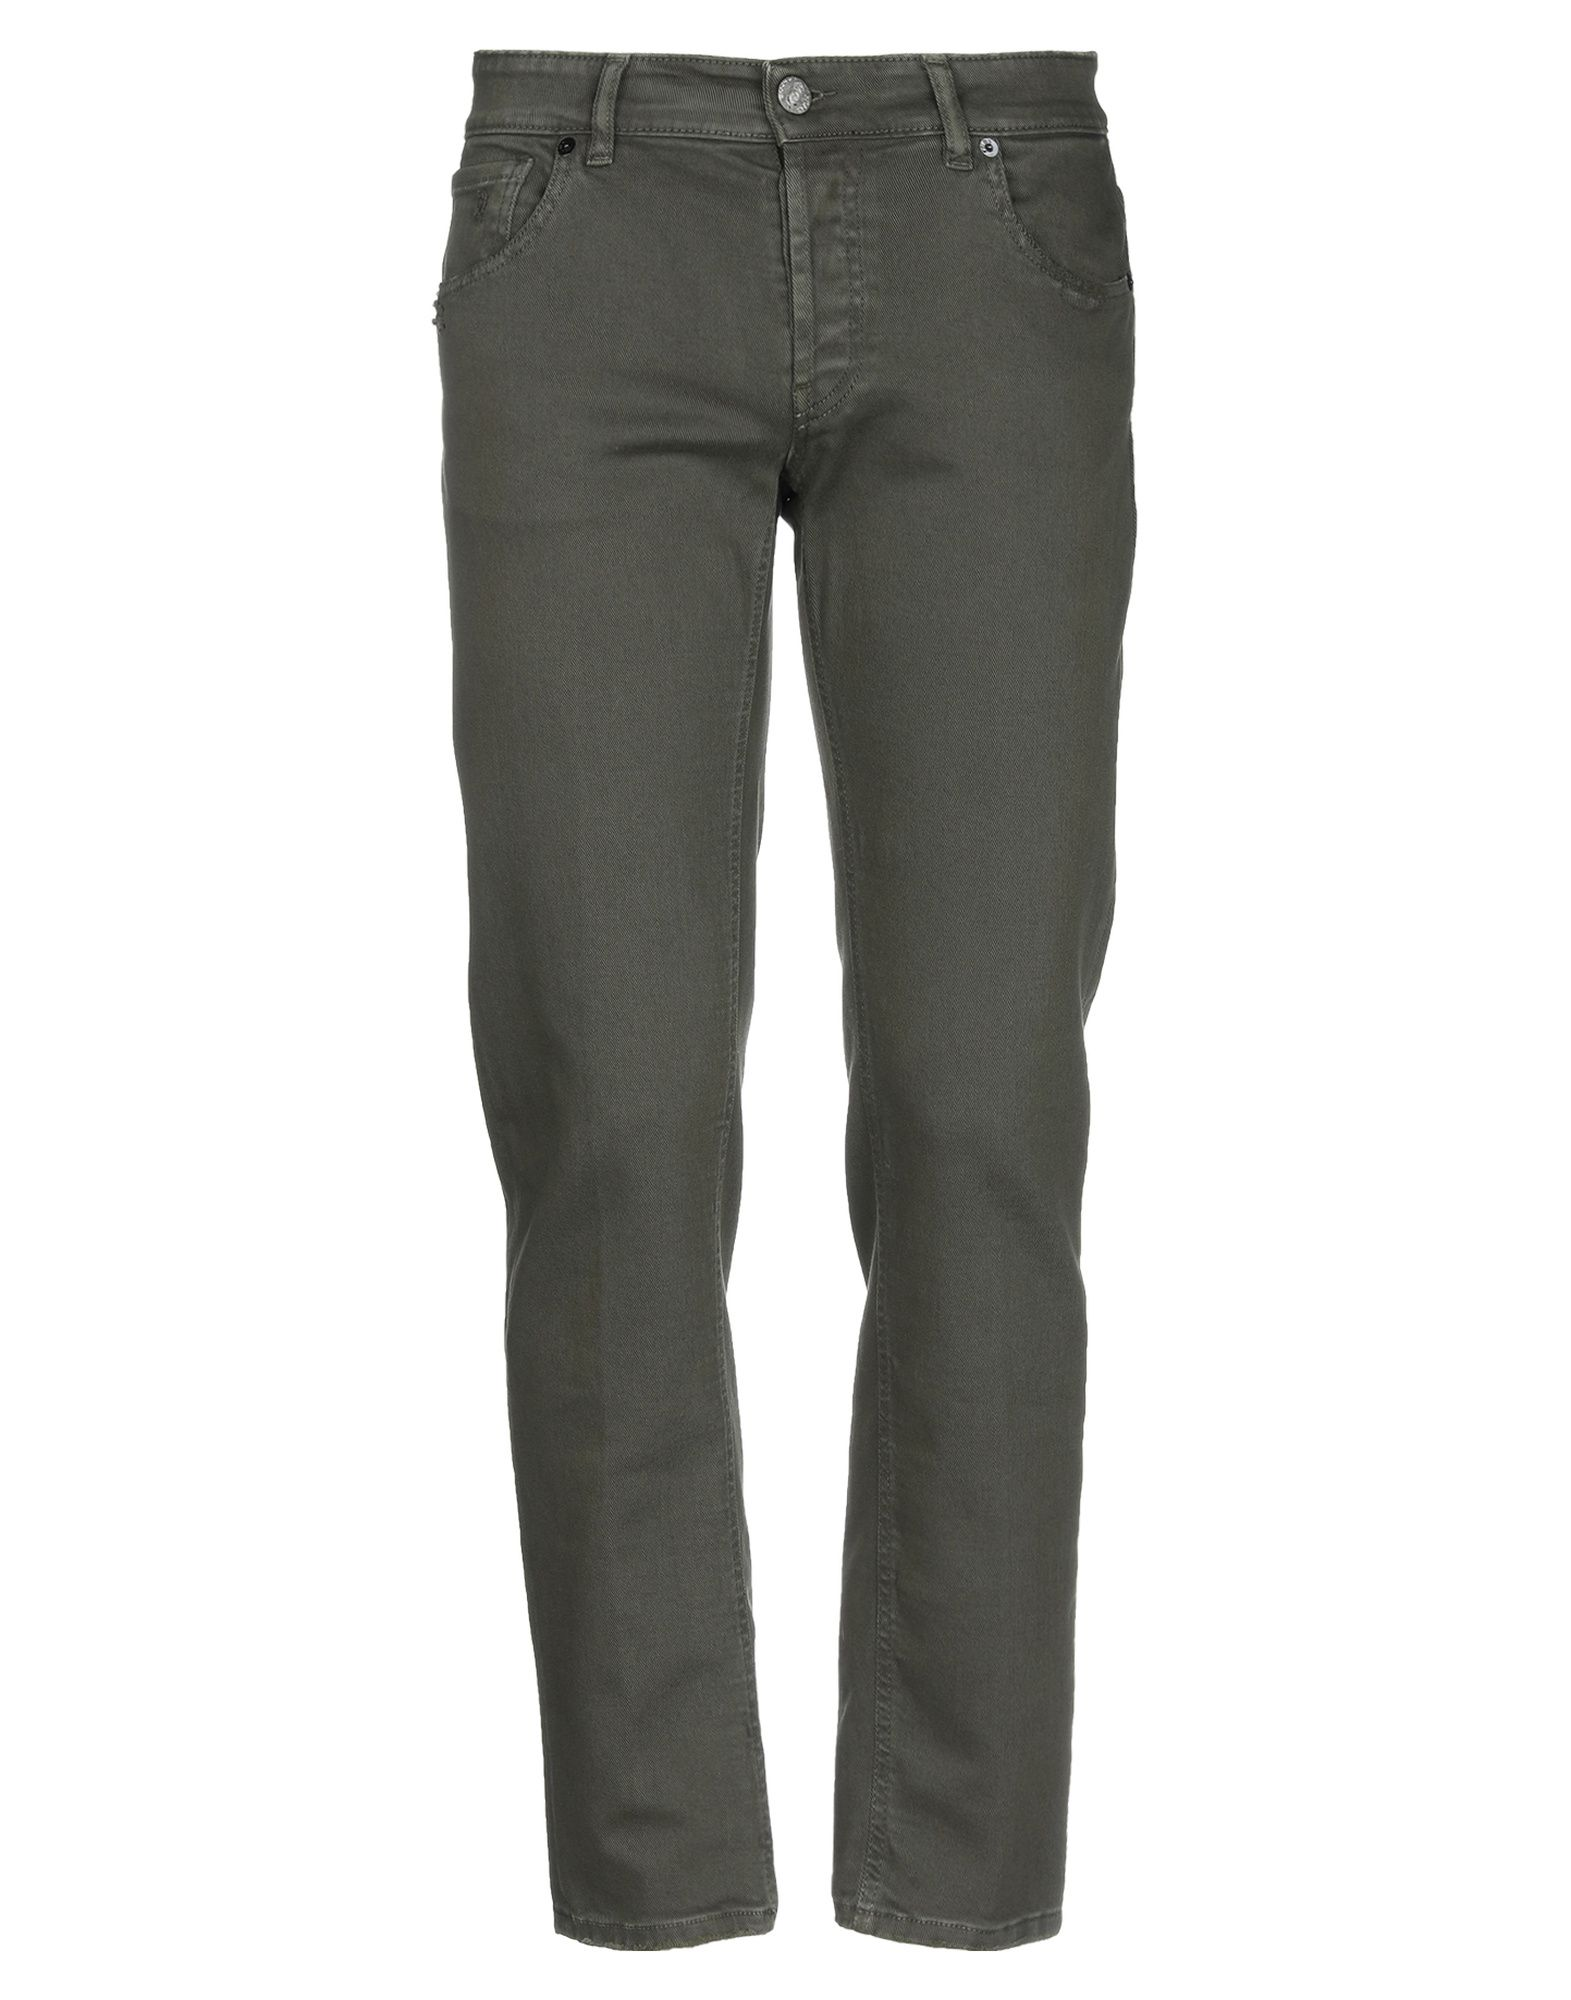 PMDS PREMIUM MOOD DENIM SUPERIOR Повседневные брюки good mood повседневные брюки